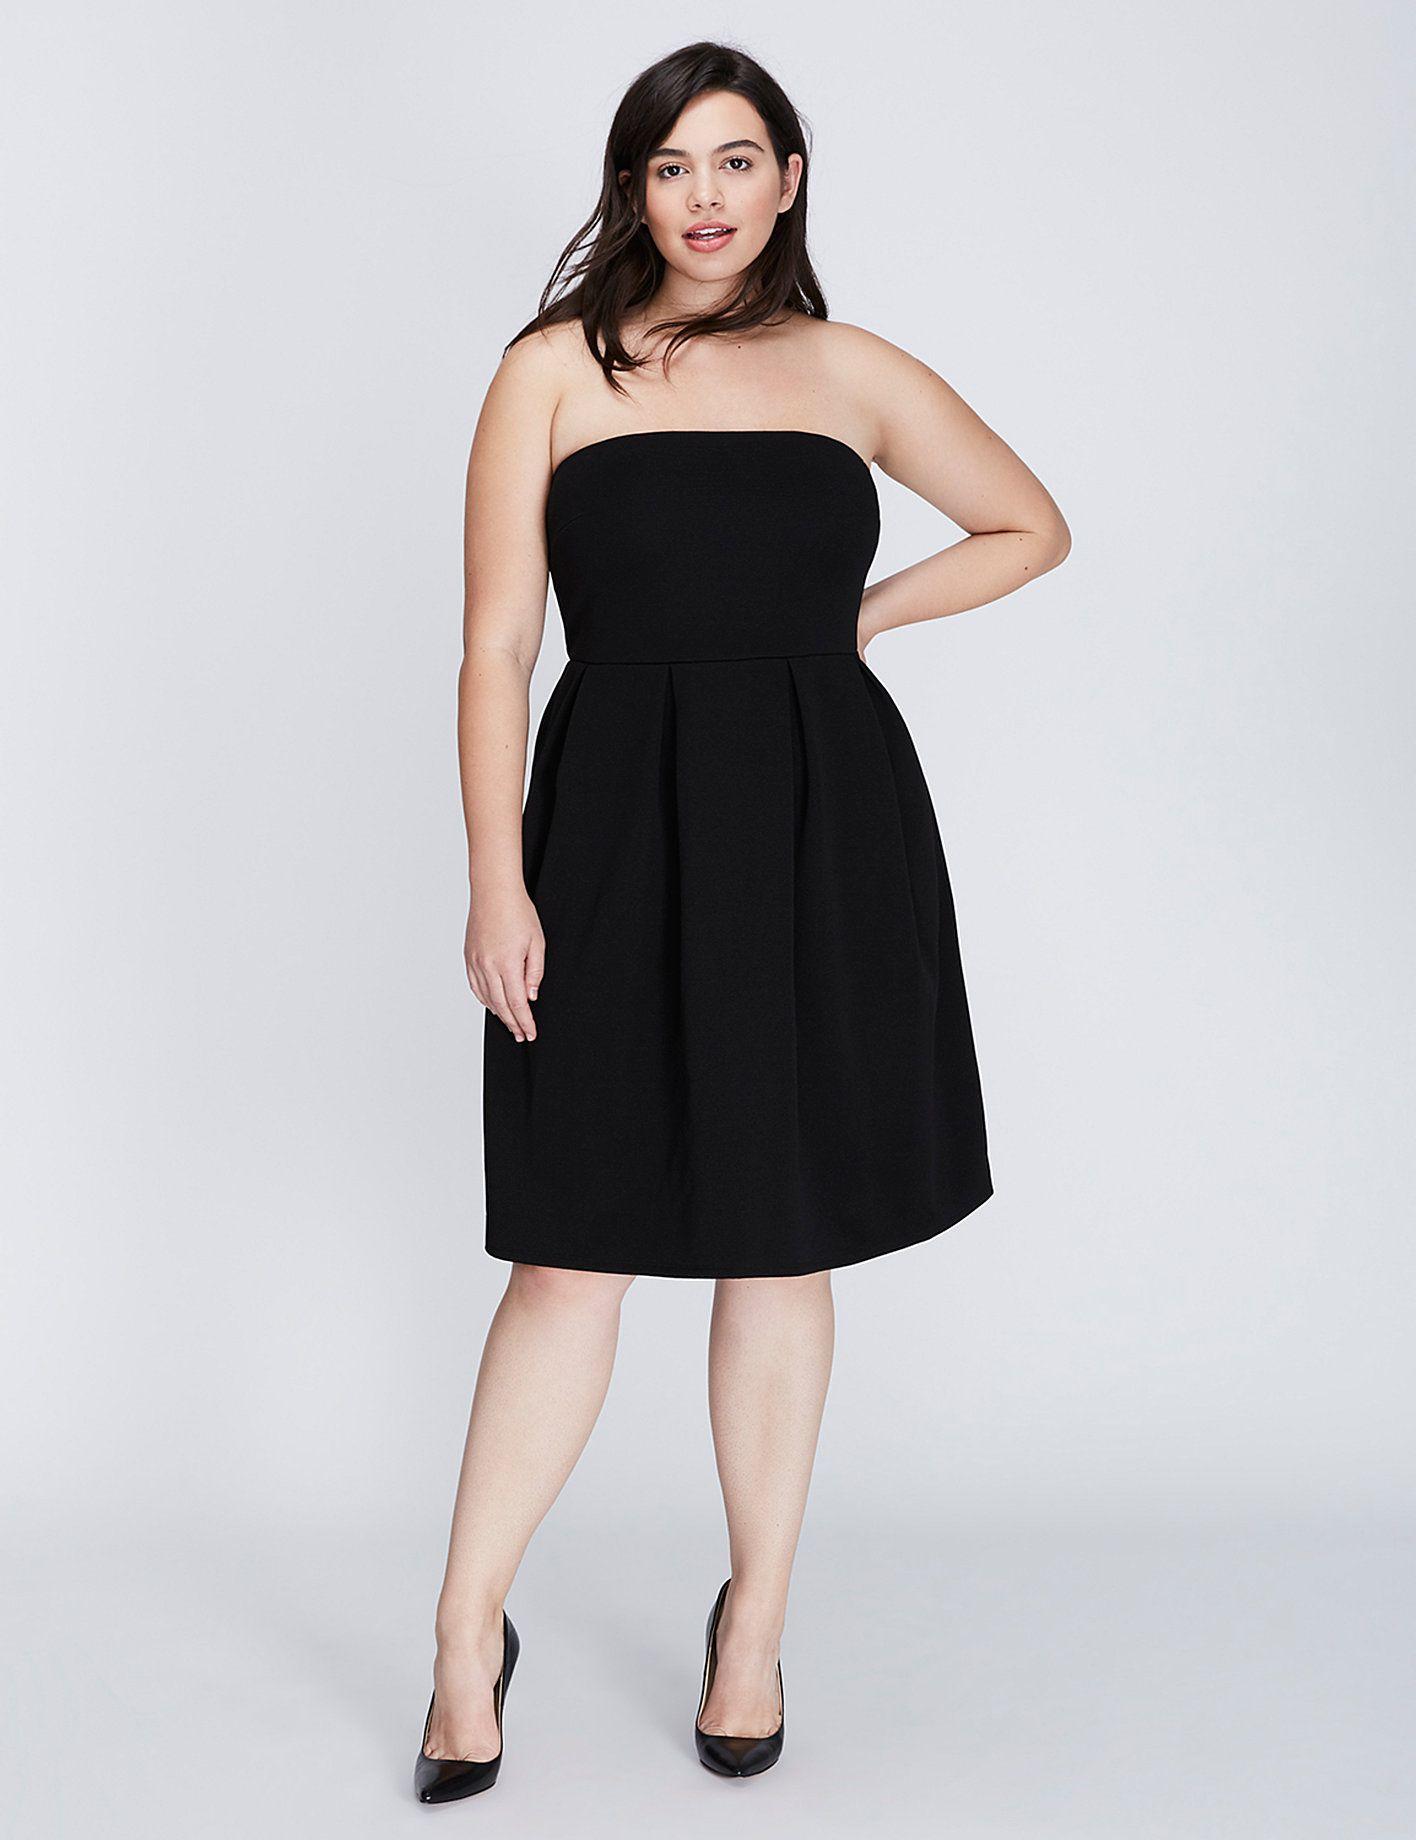 Lane Bryant | Dresses, Strapless dress